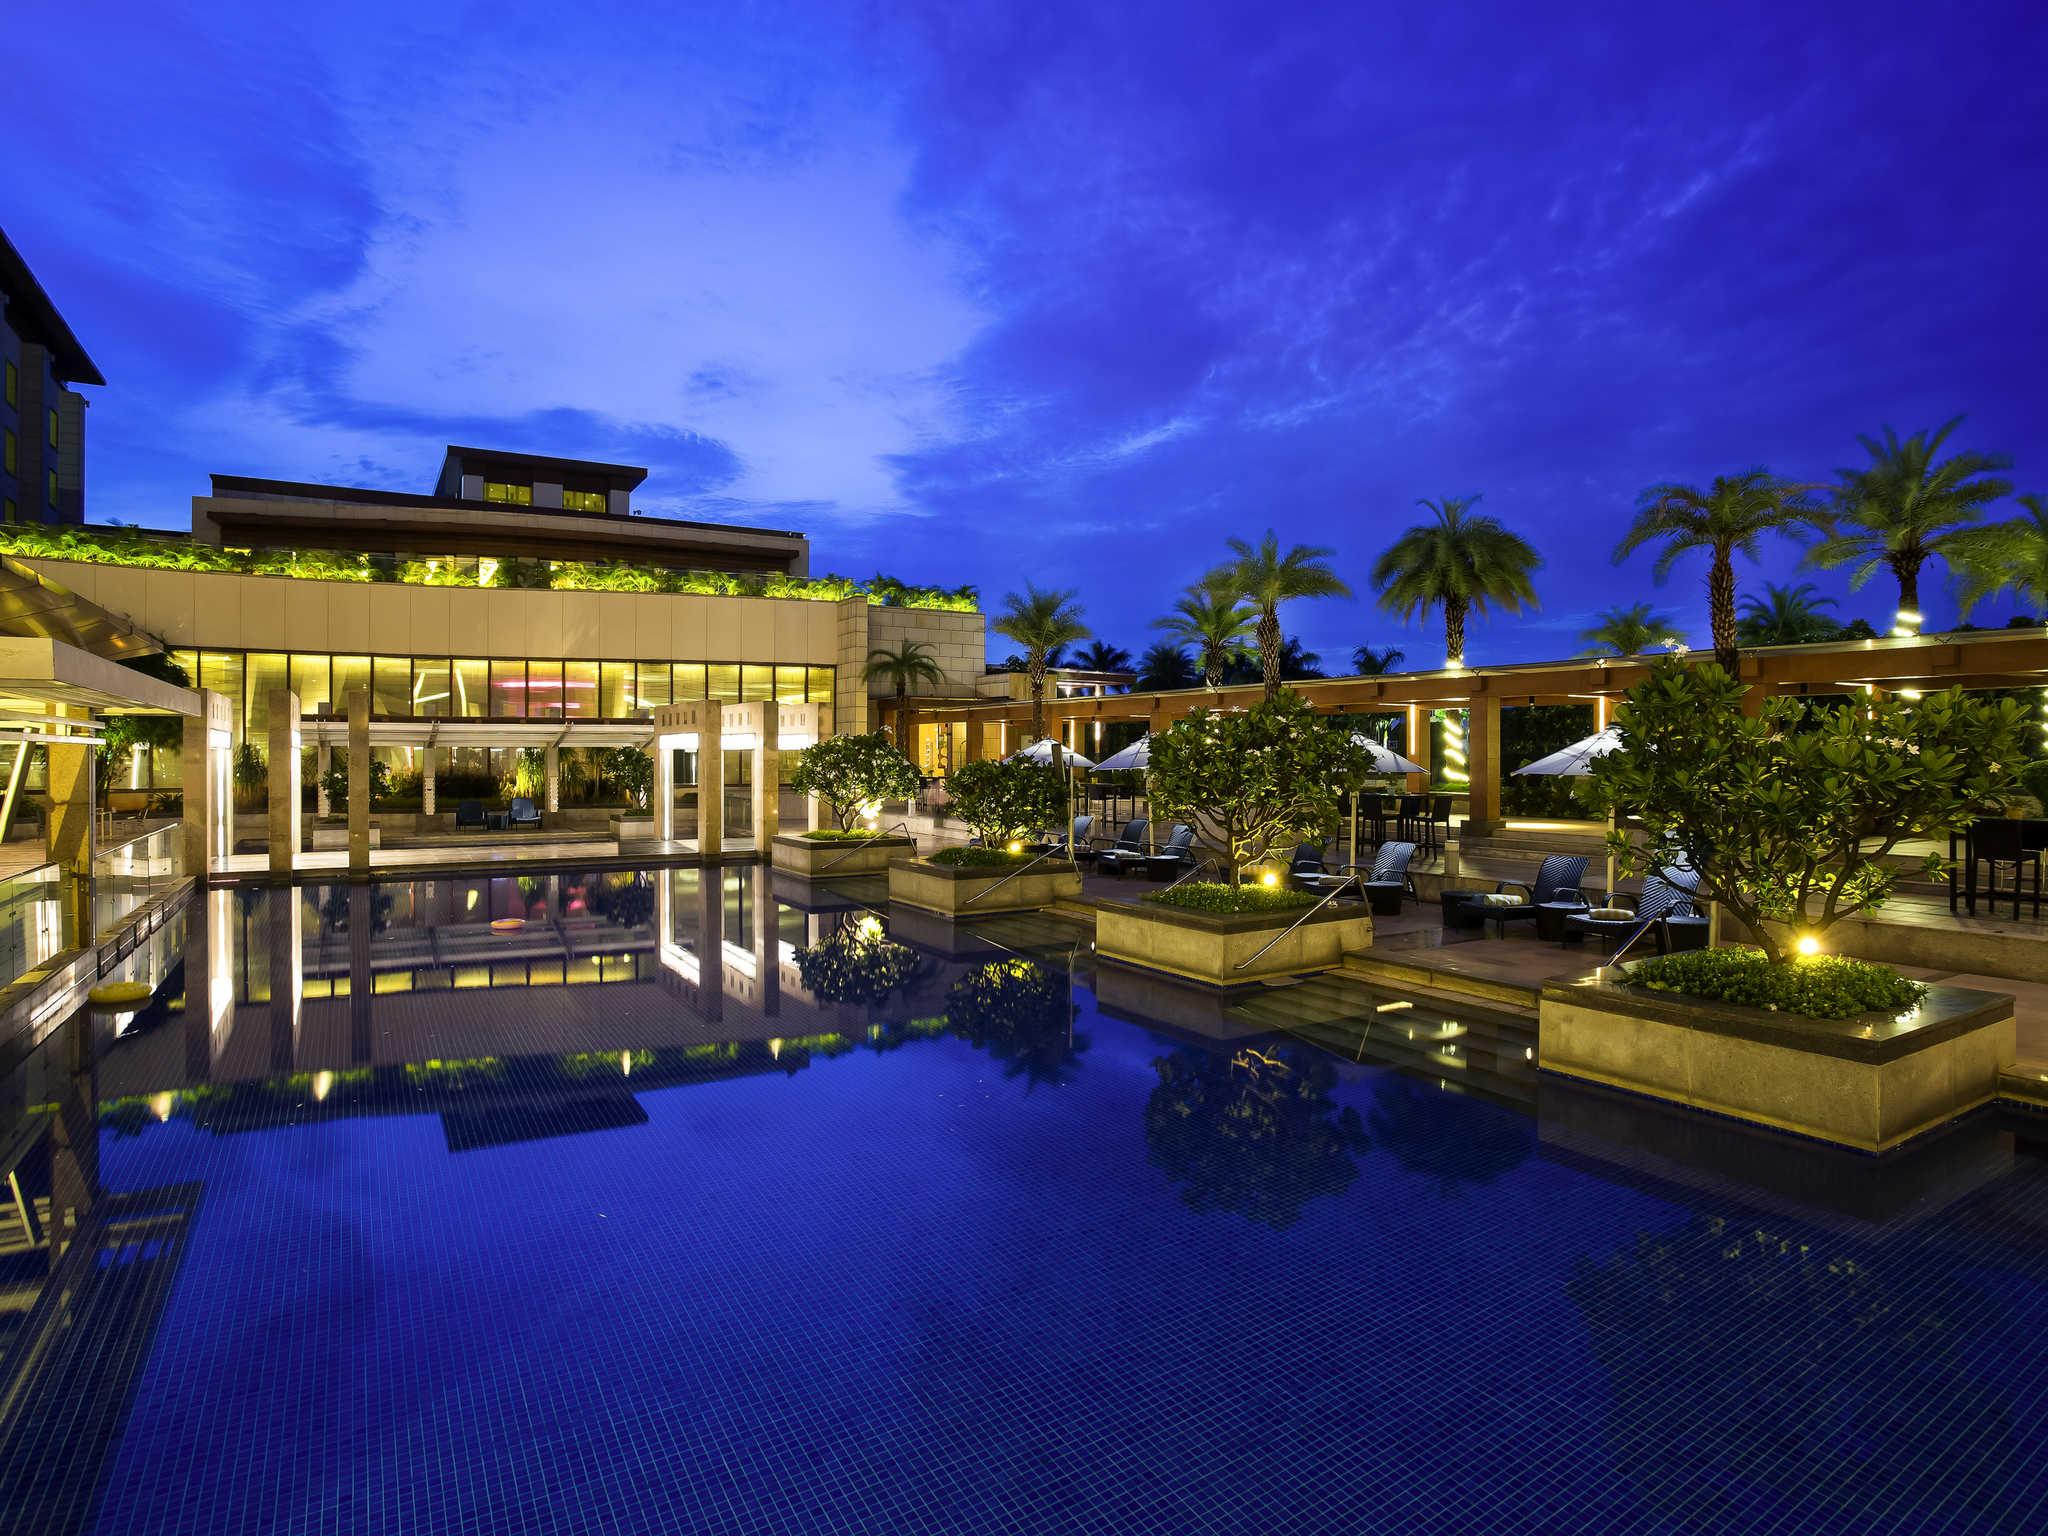 Hotel Novotel Hyderabad Airport